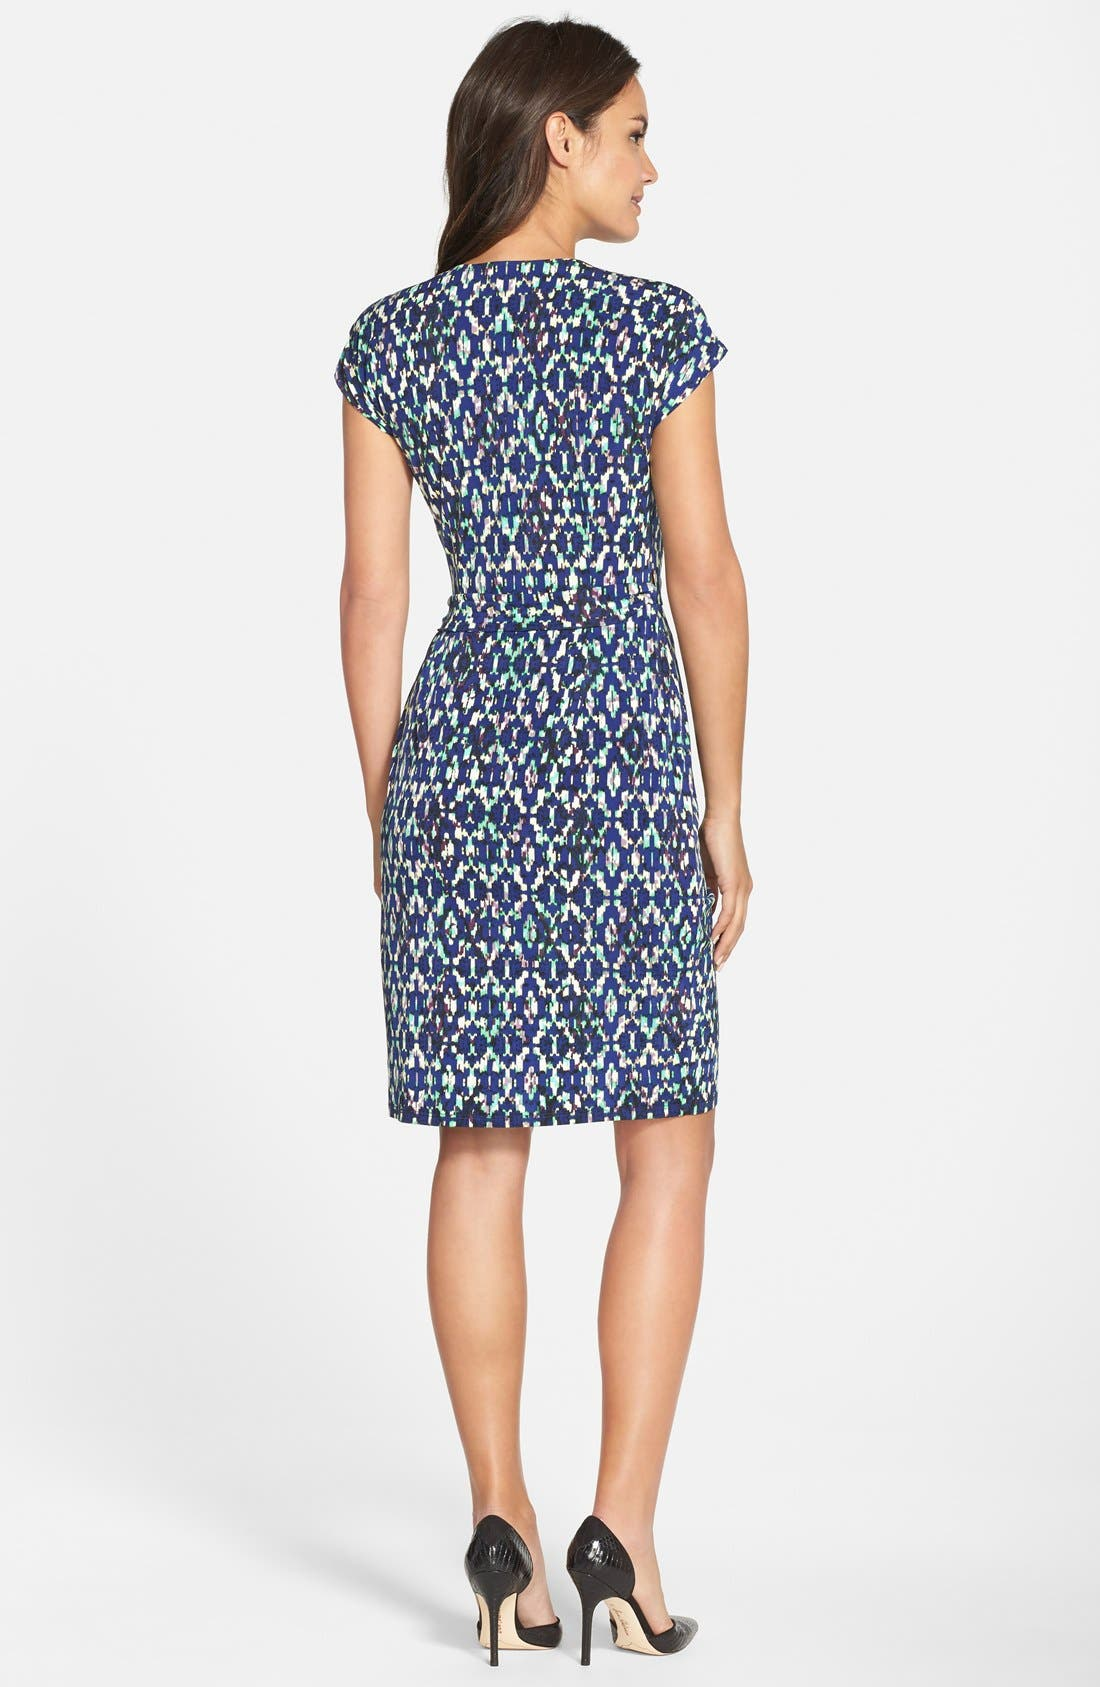 MAGGY LONDON, Ikat Print Wrap Dress, Alternate thumbnail 2, color, 400